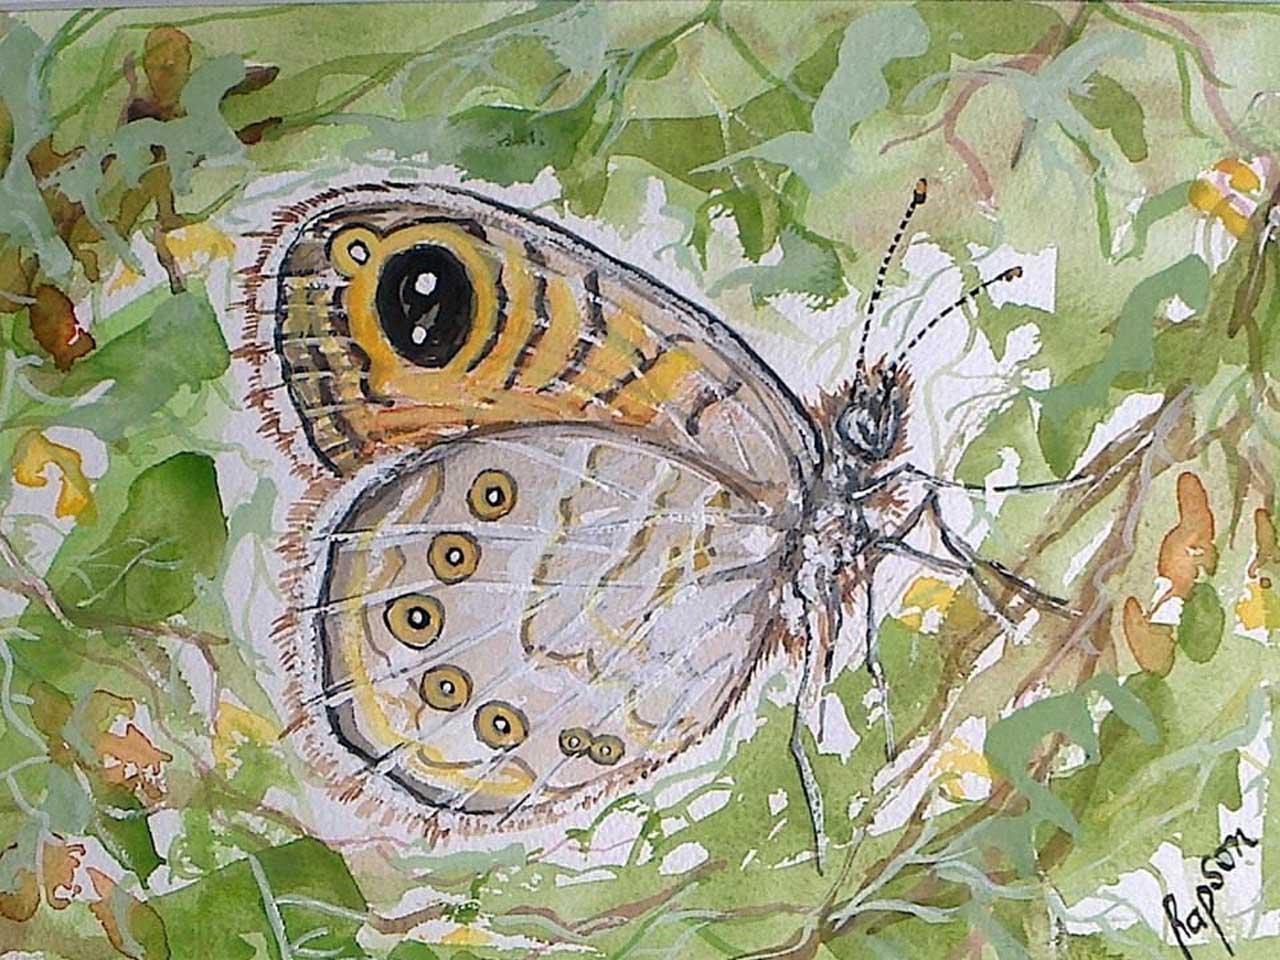 Photo: Butterfly Effect - Elaine Rapson-Grant